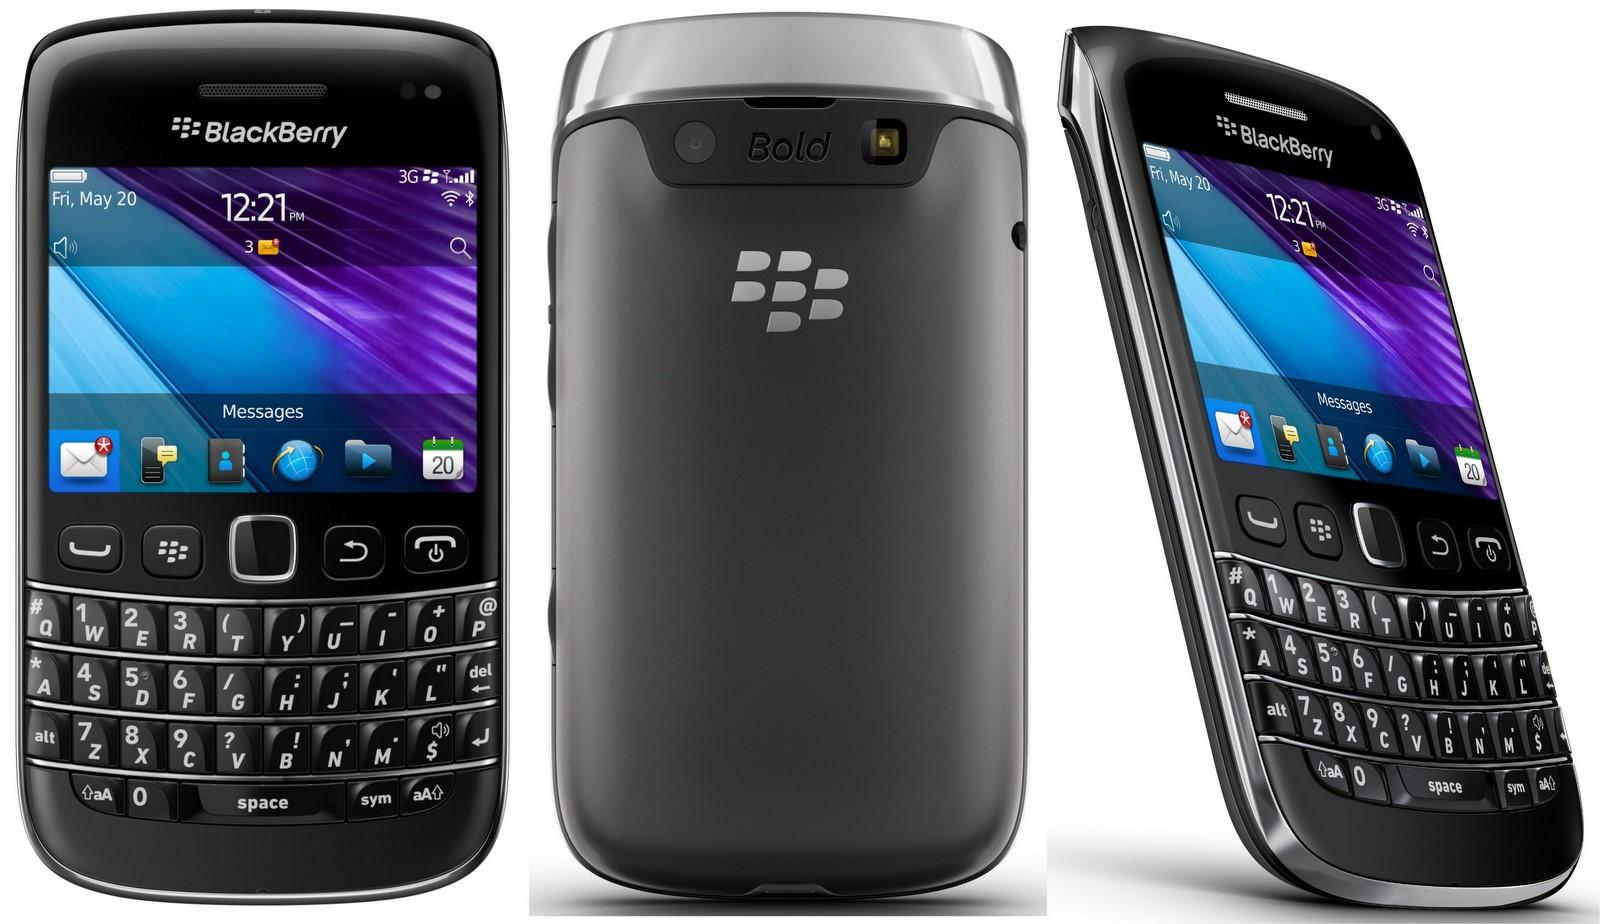 Blackberry 9900 // 9790 //9360 ����� ������ !! 9/3/2012